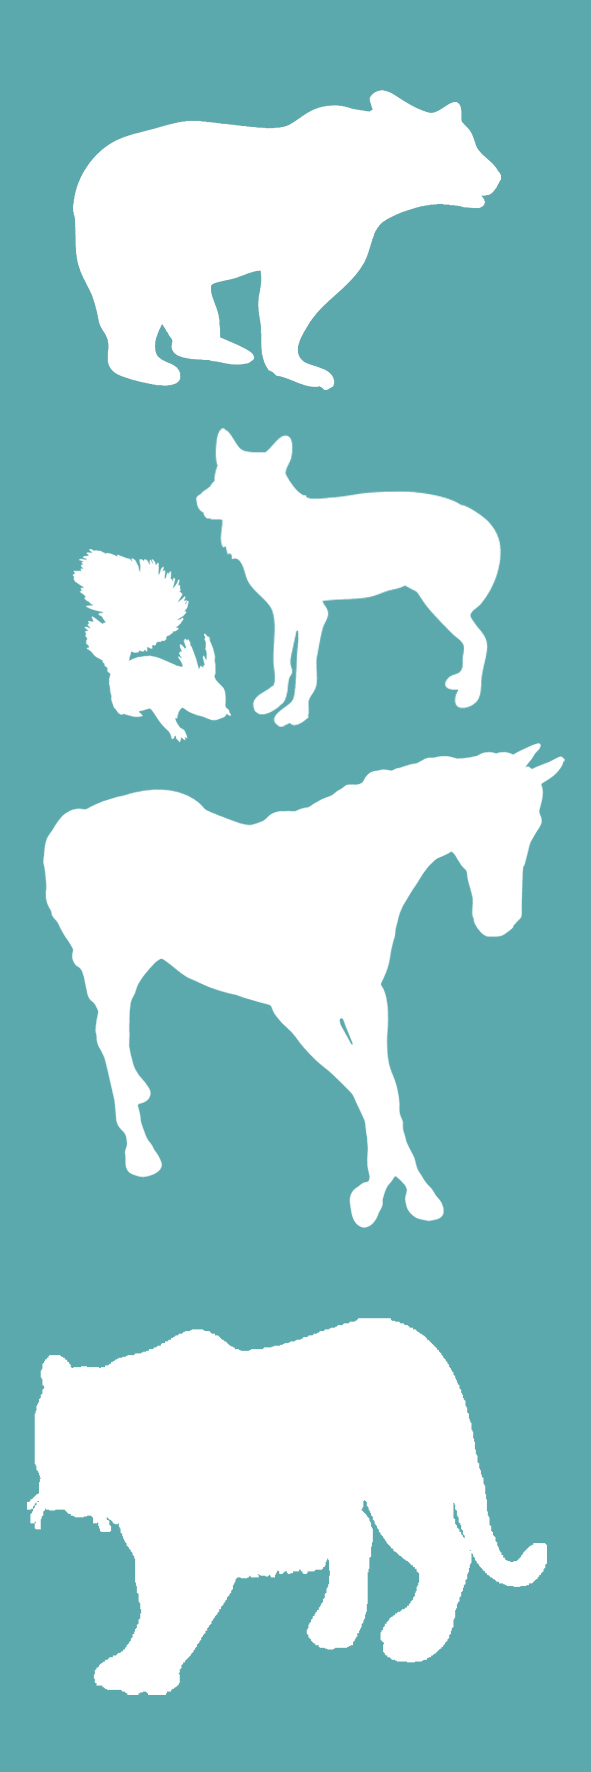 bookmark classic with animals